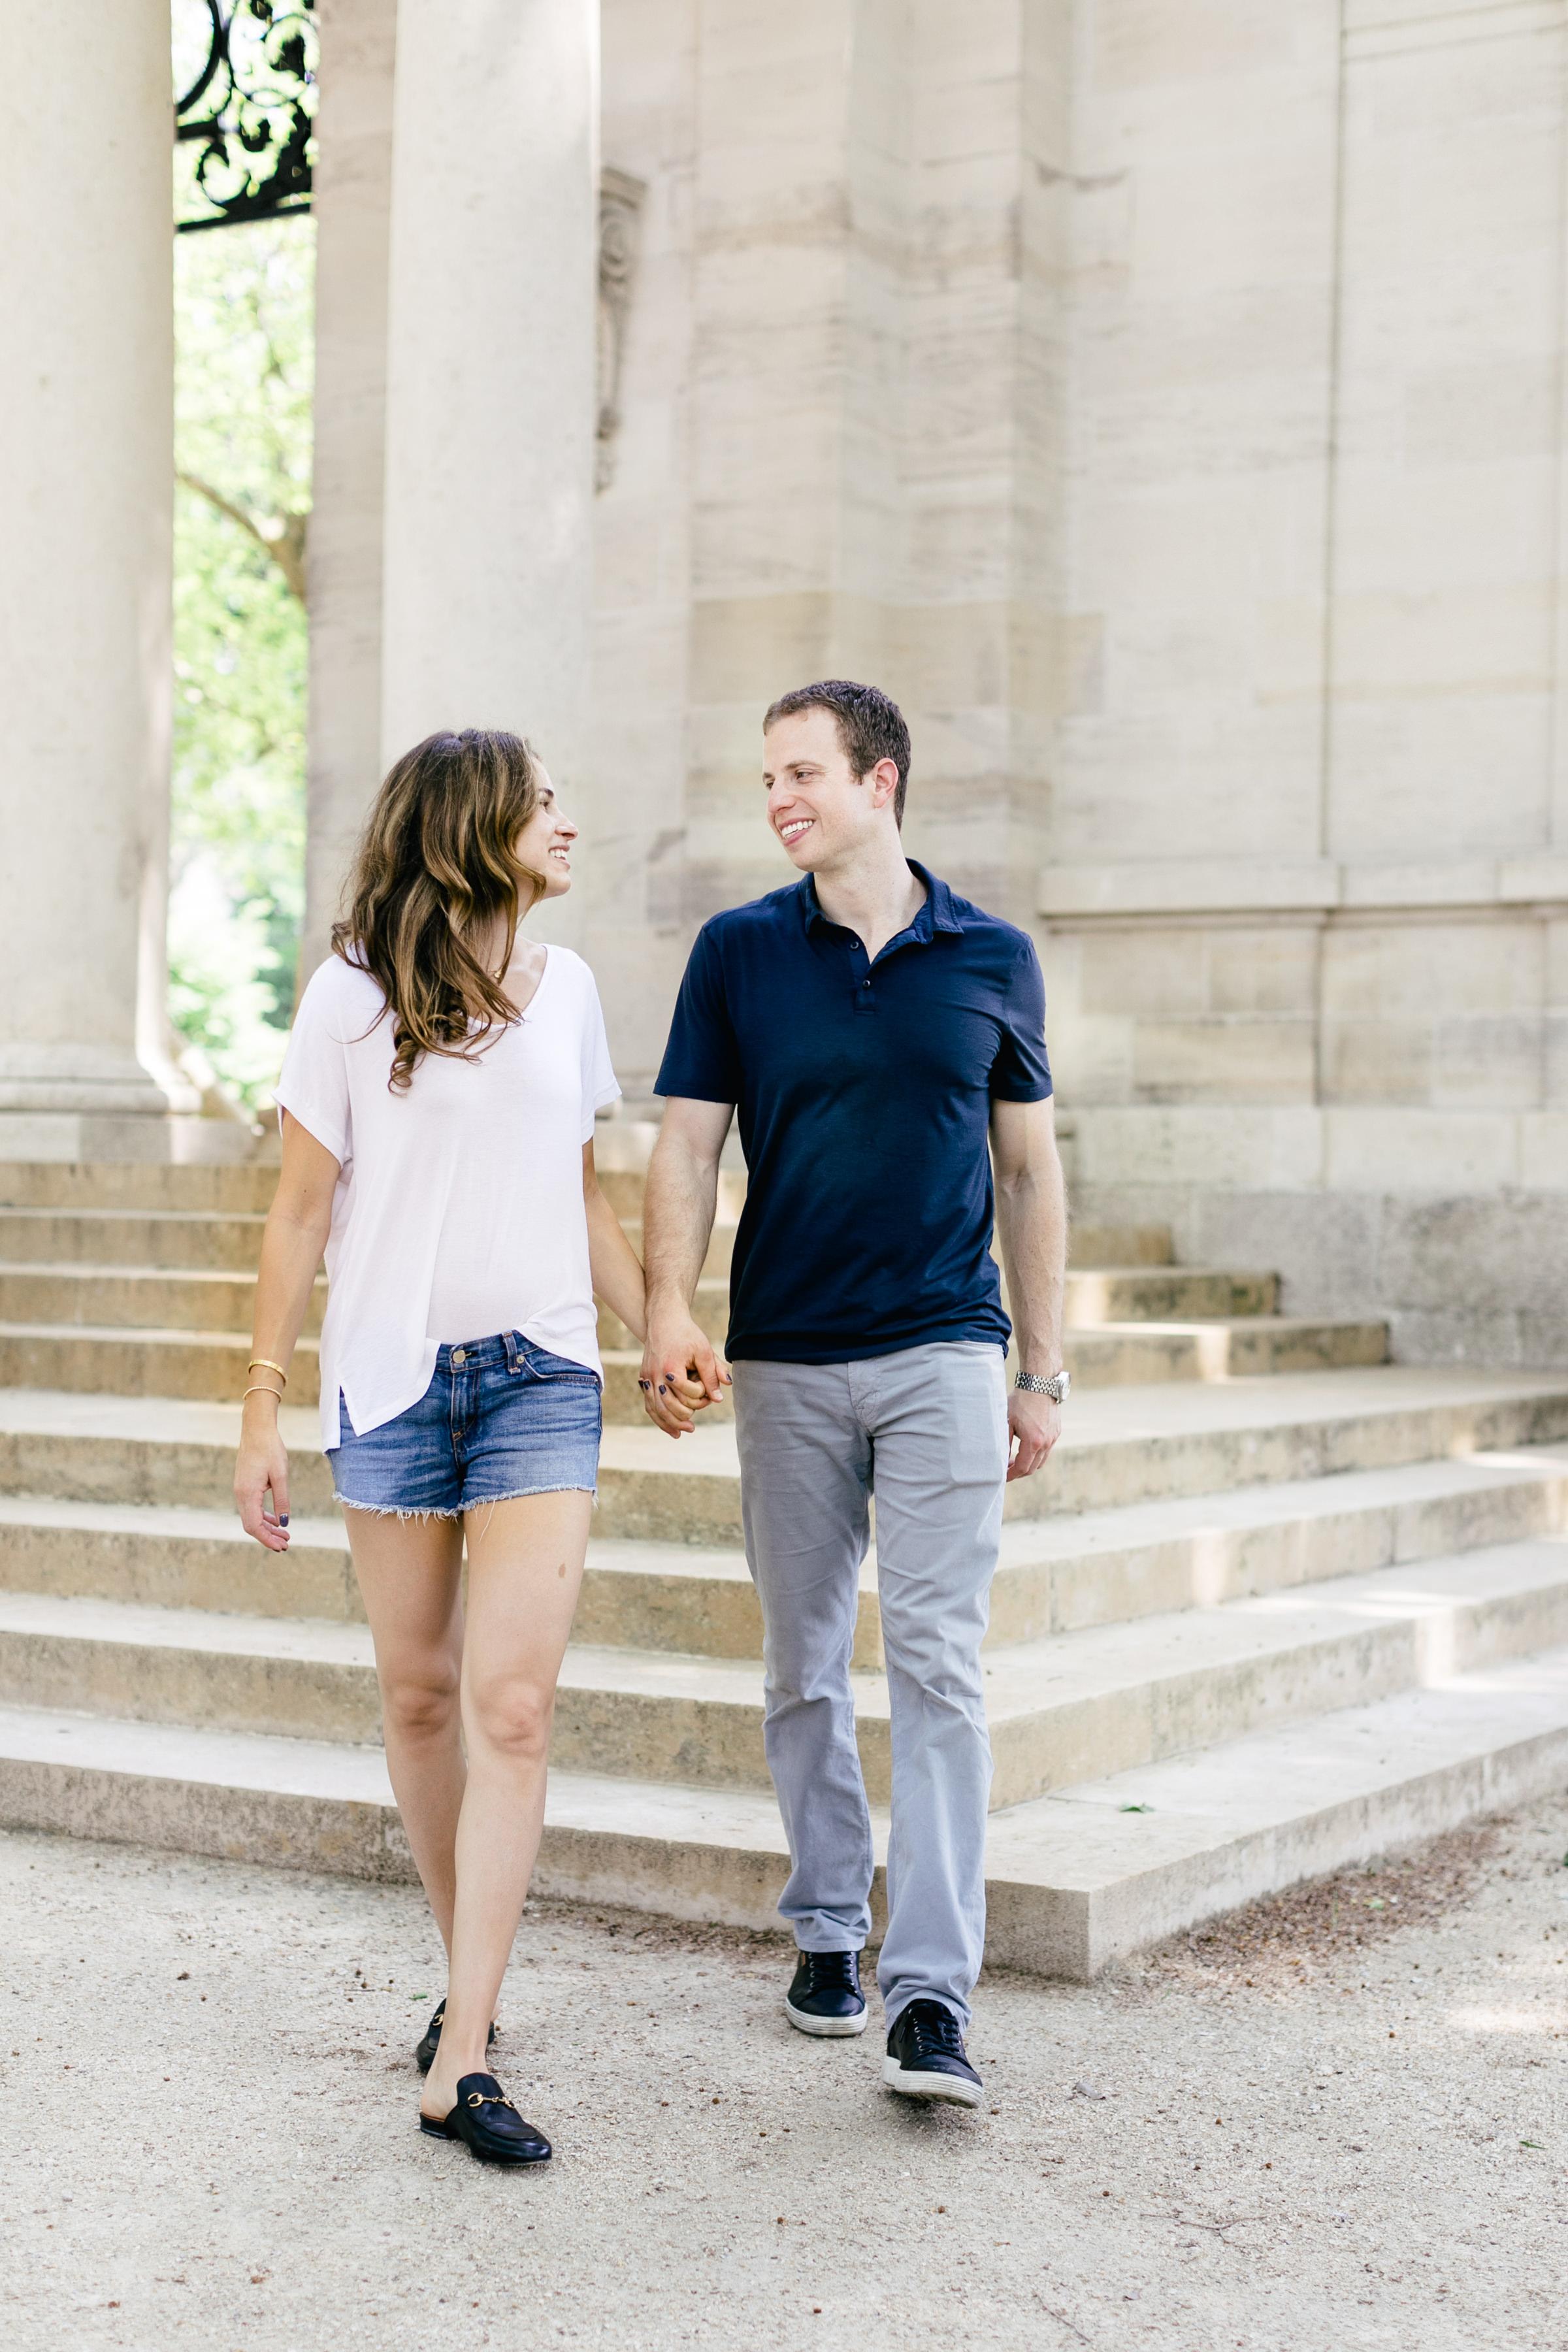 photography-natural-candid-engaged-proposal-philadelphia-wedding-rodin museum-barnes foundation-parkway-modern-lifestyle-16.JPG